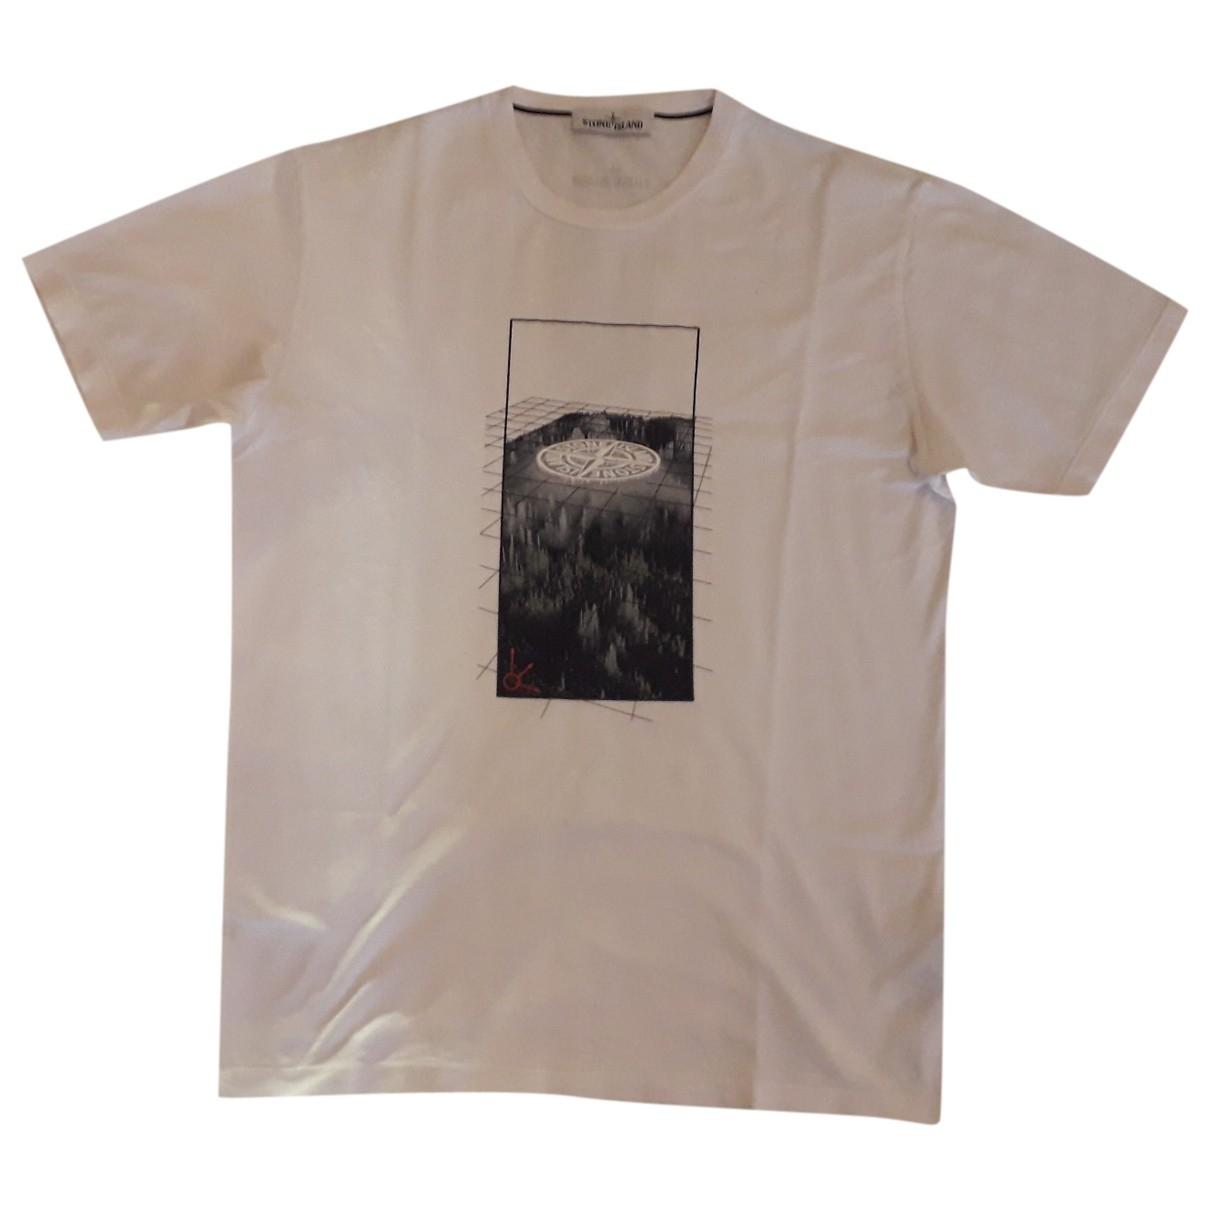 Stone Island - Tee shirts   pour homme en coton - blanc